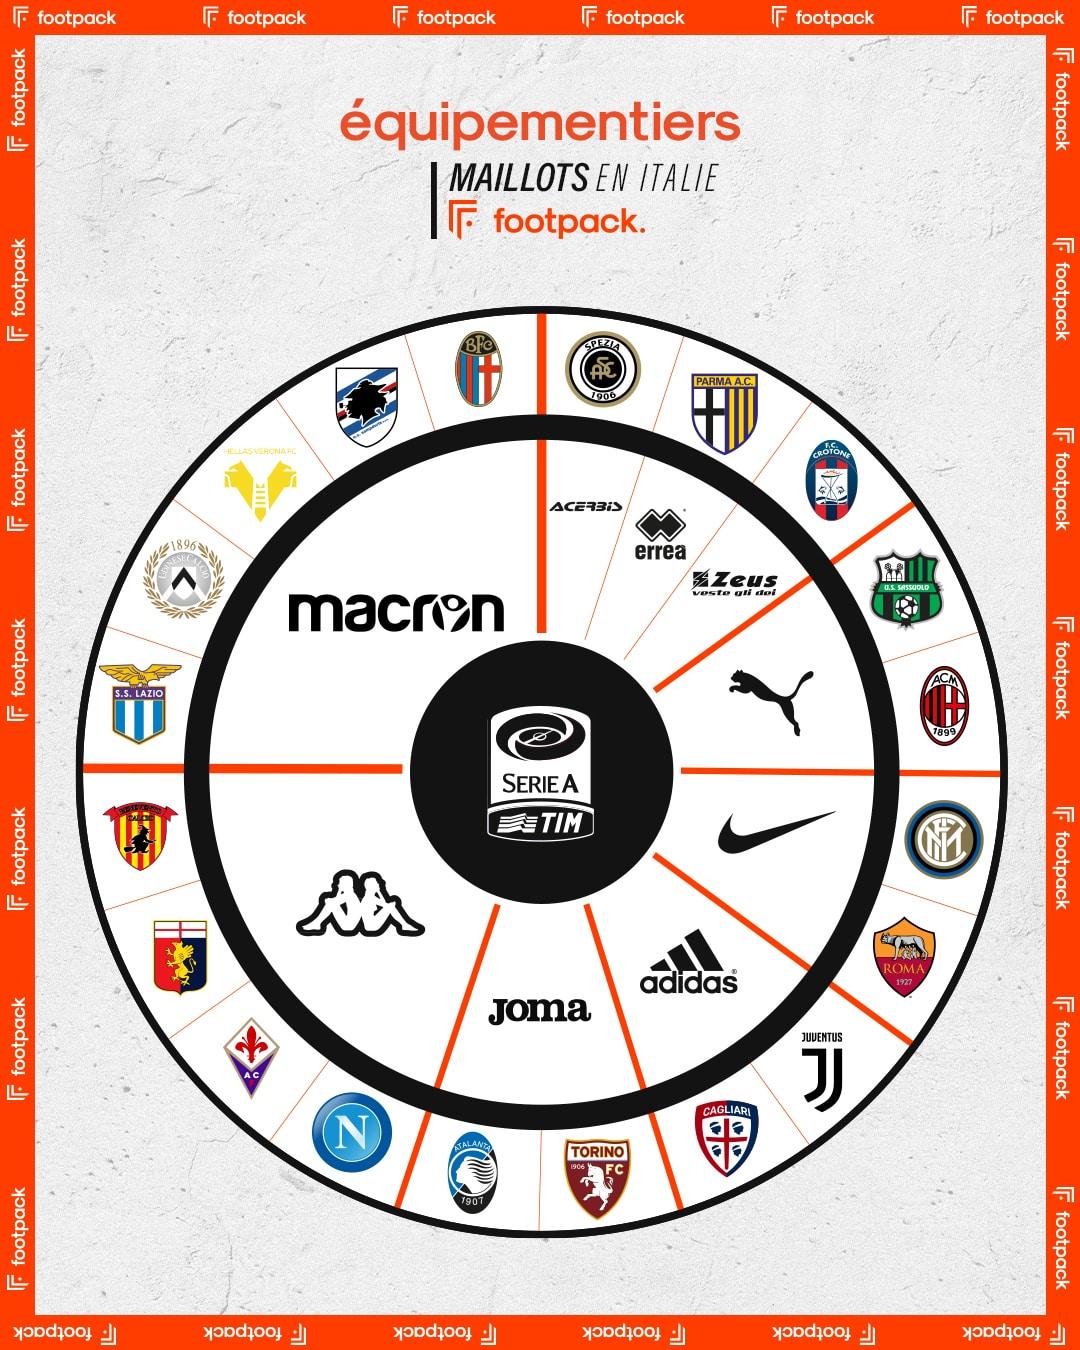 infographie-equipementier-serie-a-TIM-2020-2021-footapck